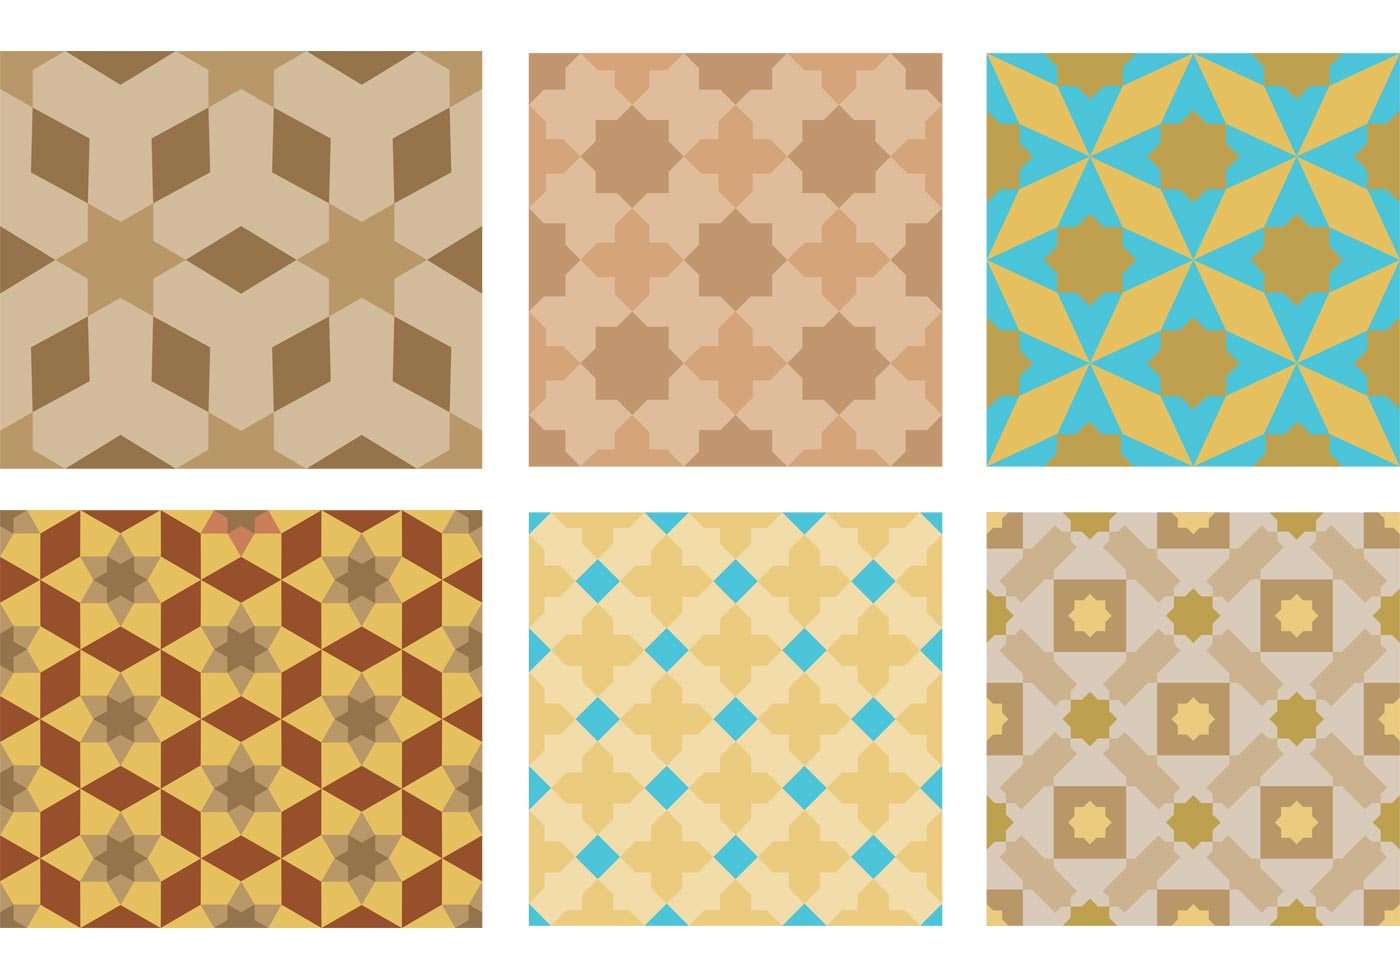 Morocco Motif Pattern Vectors - Download Free Vector Art, Stock ...